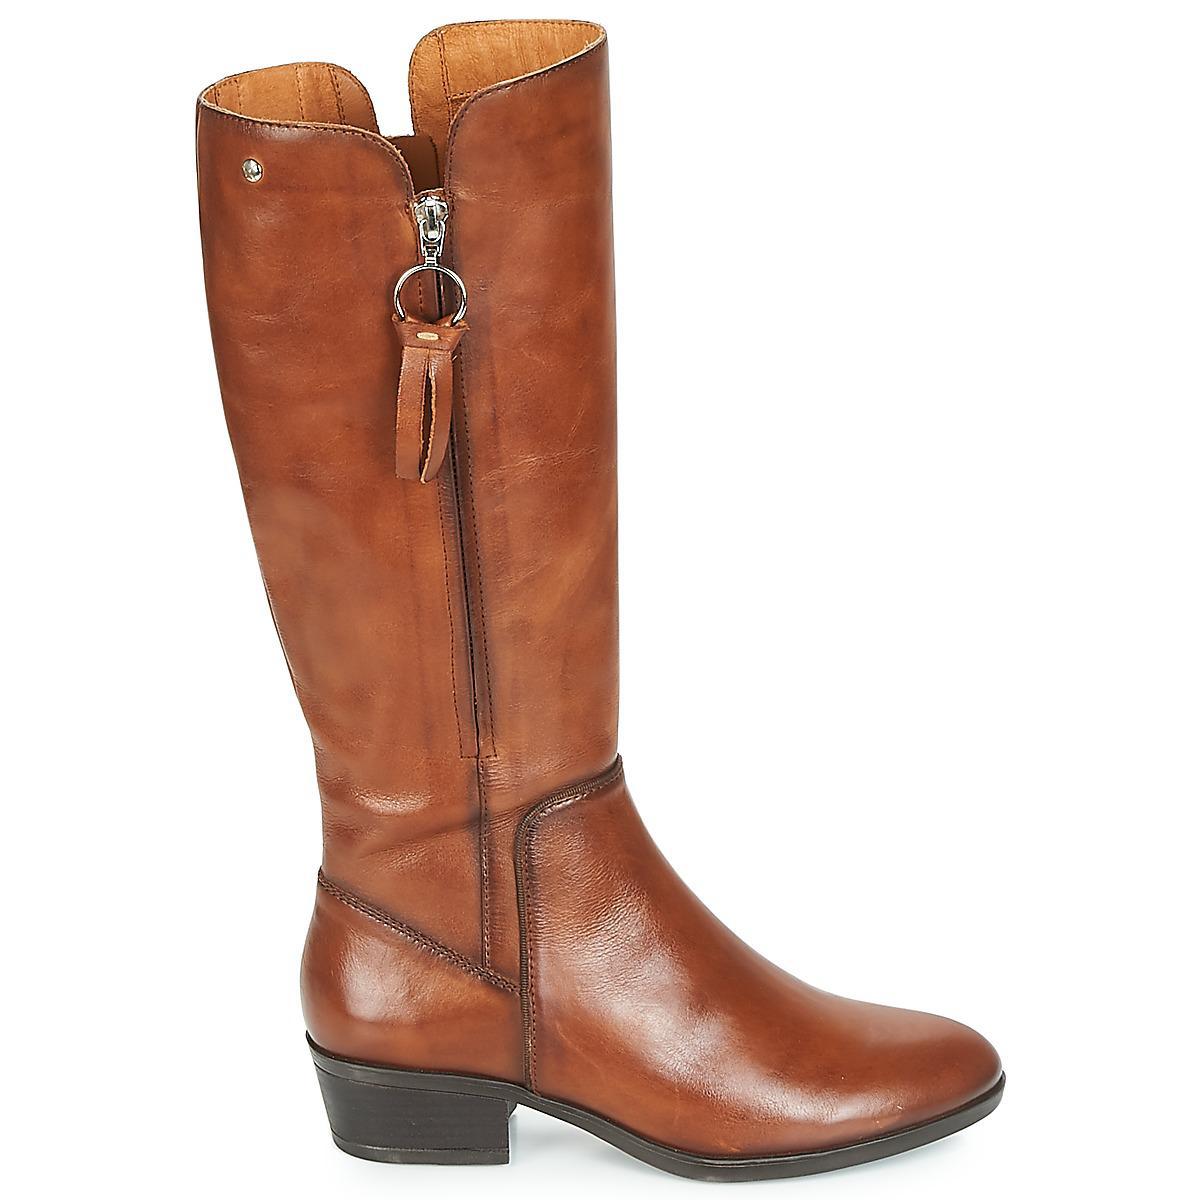 98c084dceca5 Pikolinos - Daroca W1u Women s High Boots In Brown - Lyst. View fullscreen